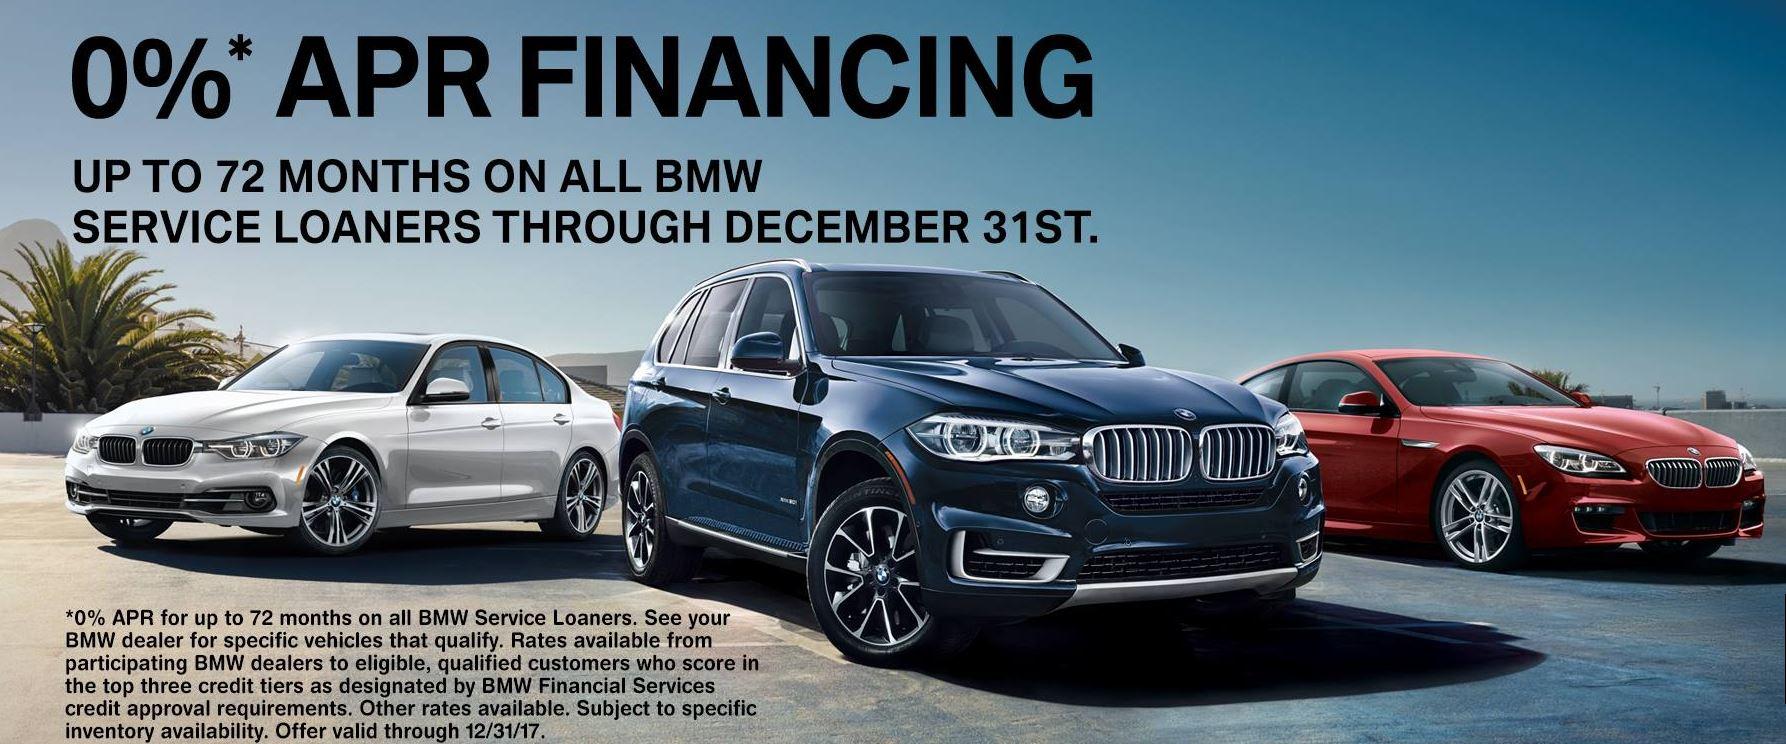 Bmw Cpo Financing  BMW